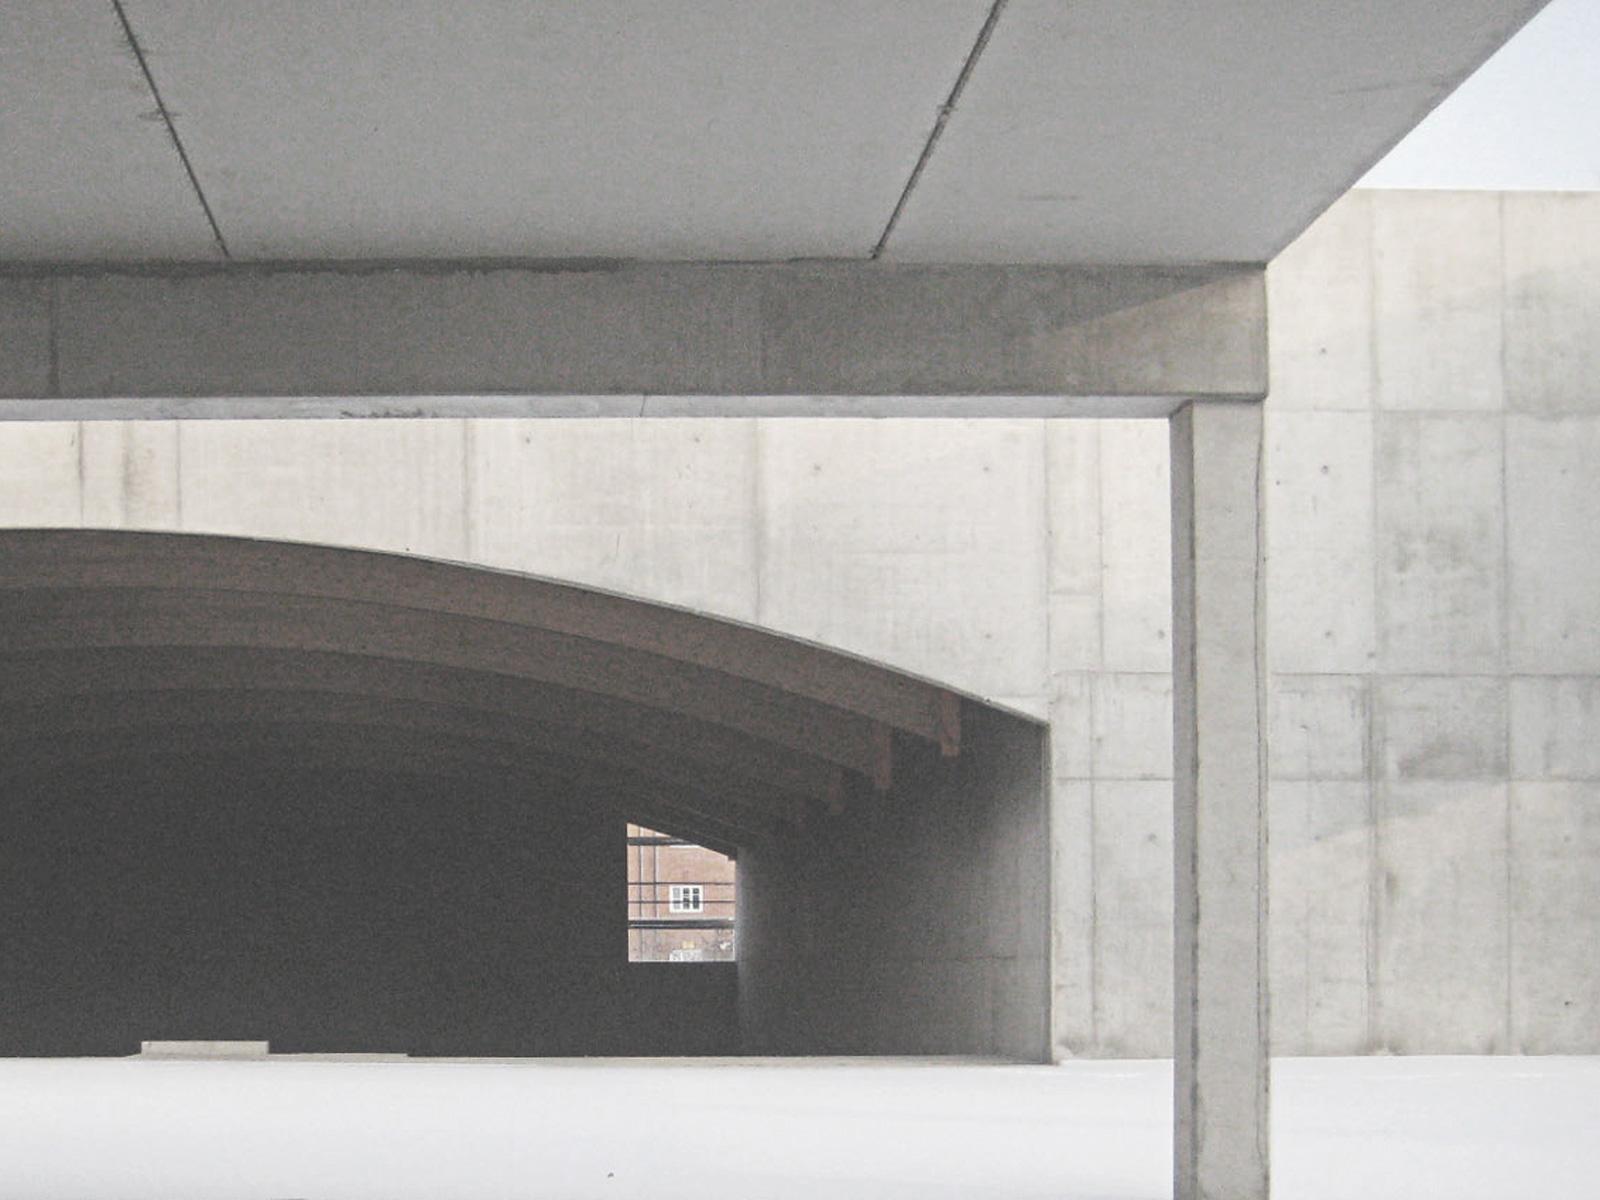 Schilling Architekten studiogold leipzig hamburg